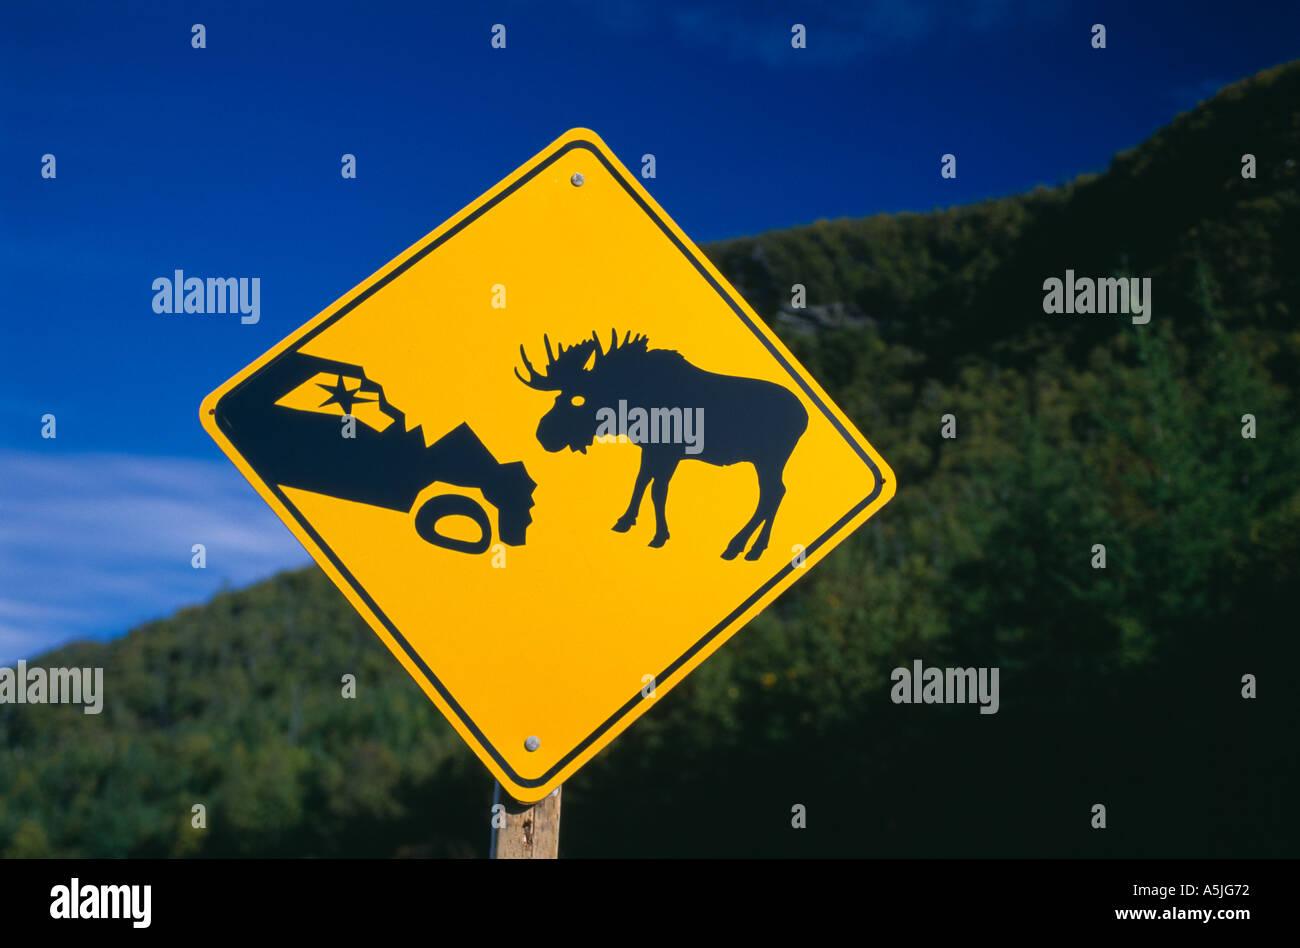 Moose Crossing Raod Sign beware Gros Morne National Park Newfoundland Canada - Stock Image